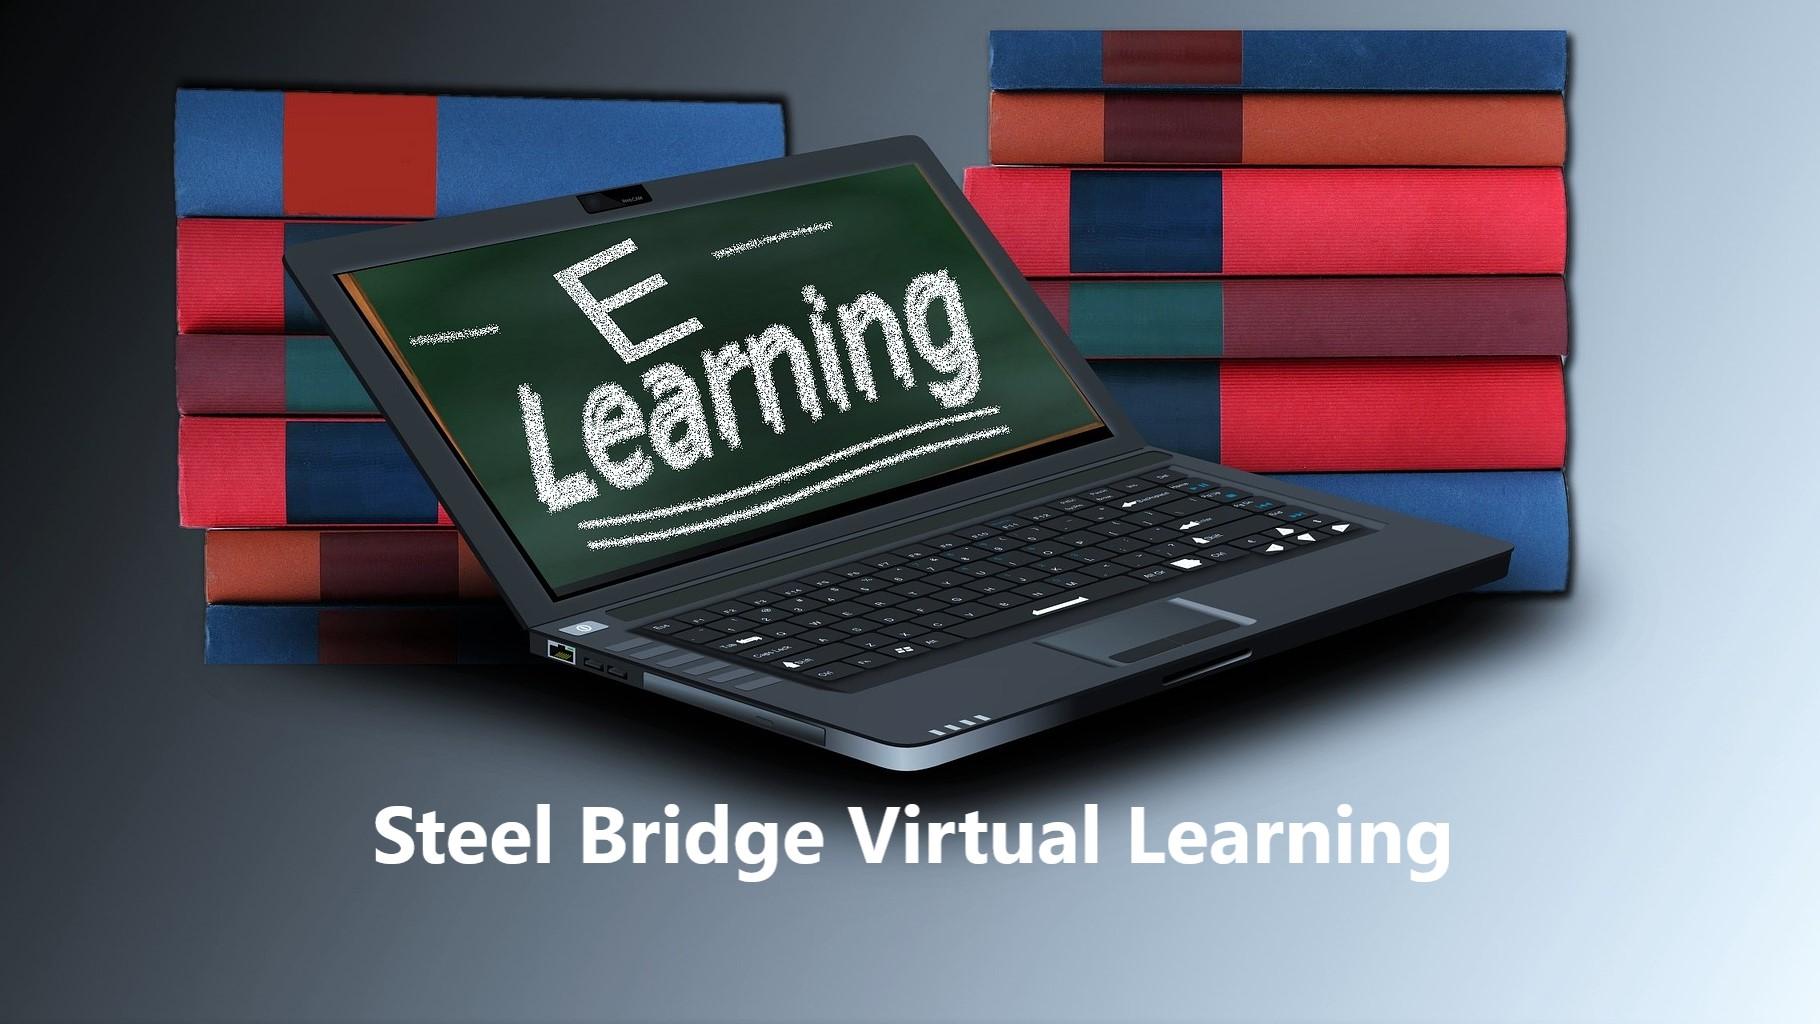 Steel Bridge Virtual Learning